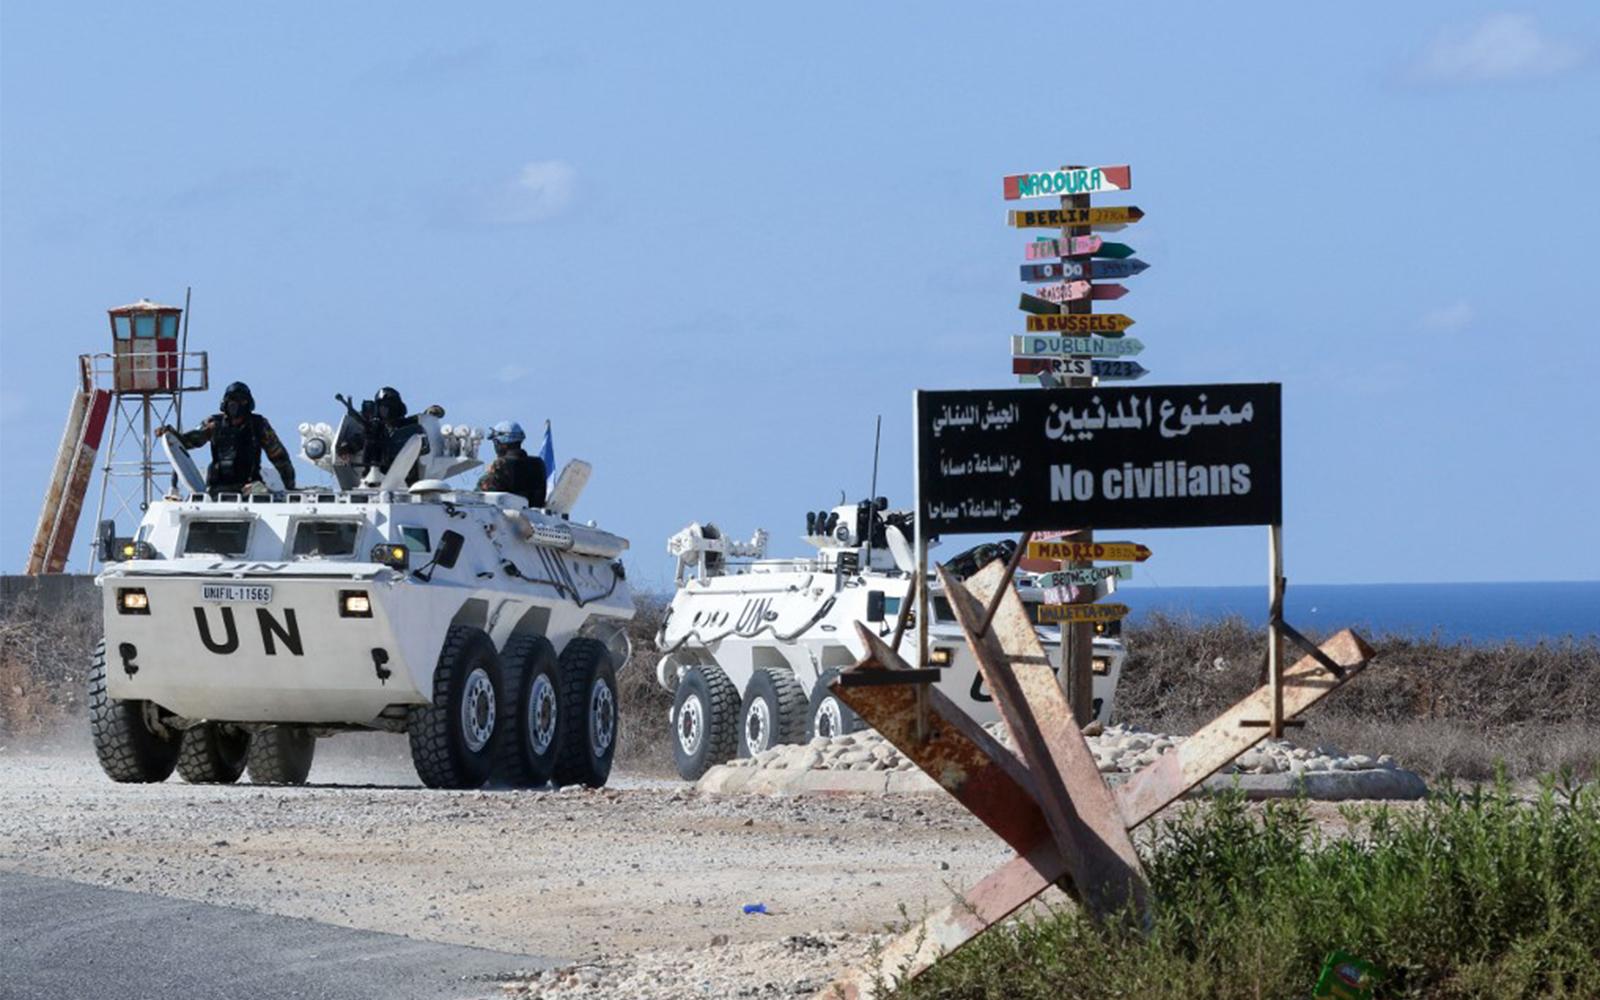 Frontière maritime Israël-Liban: des discussions